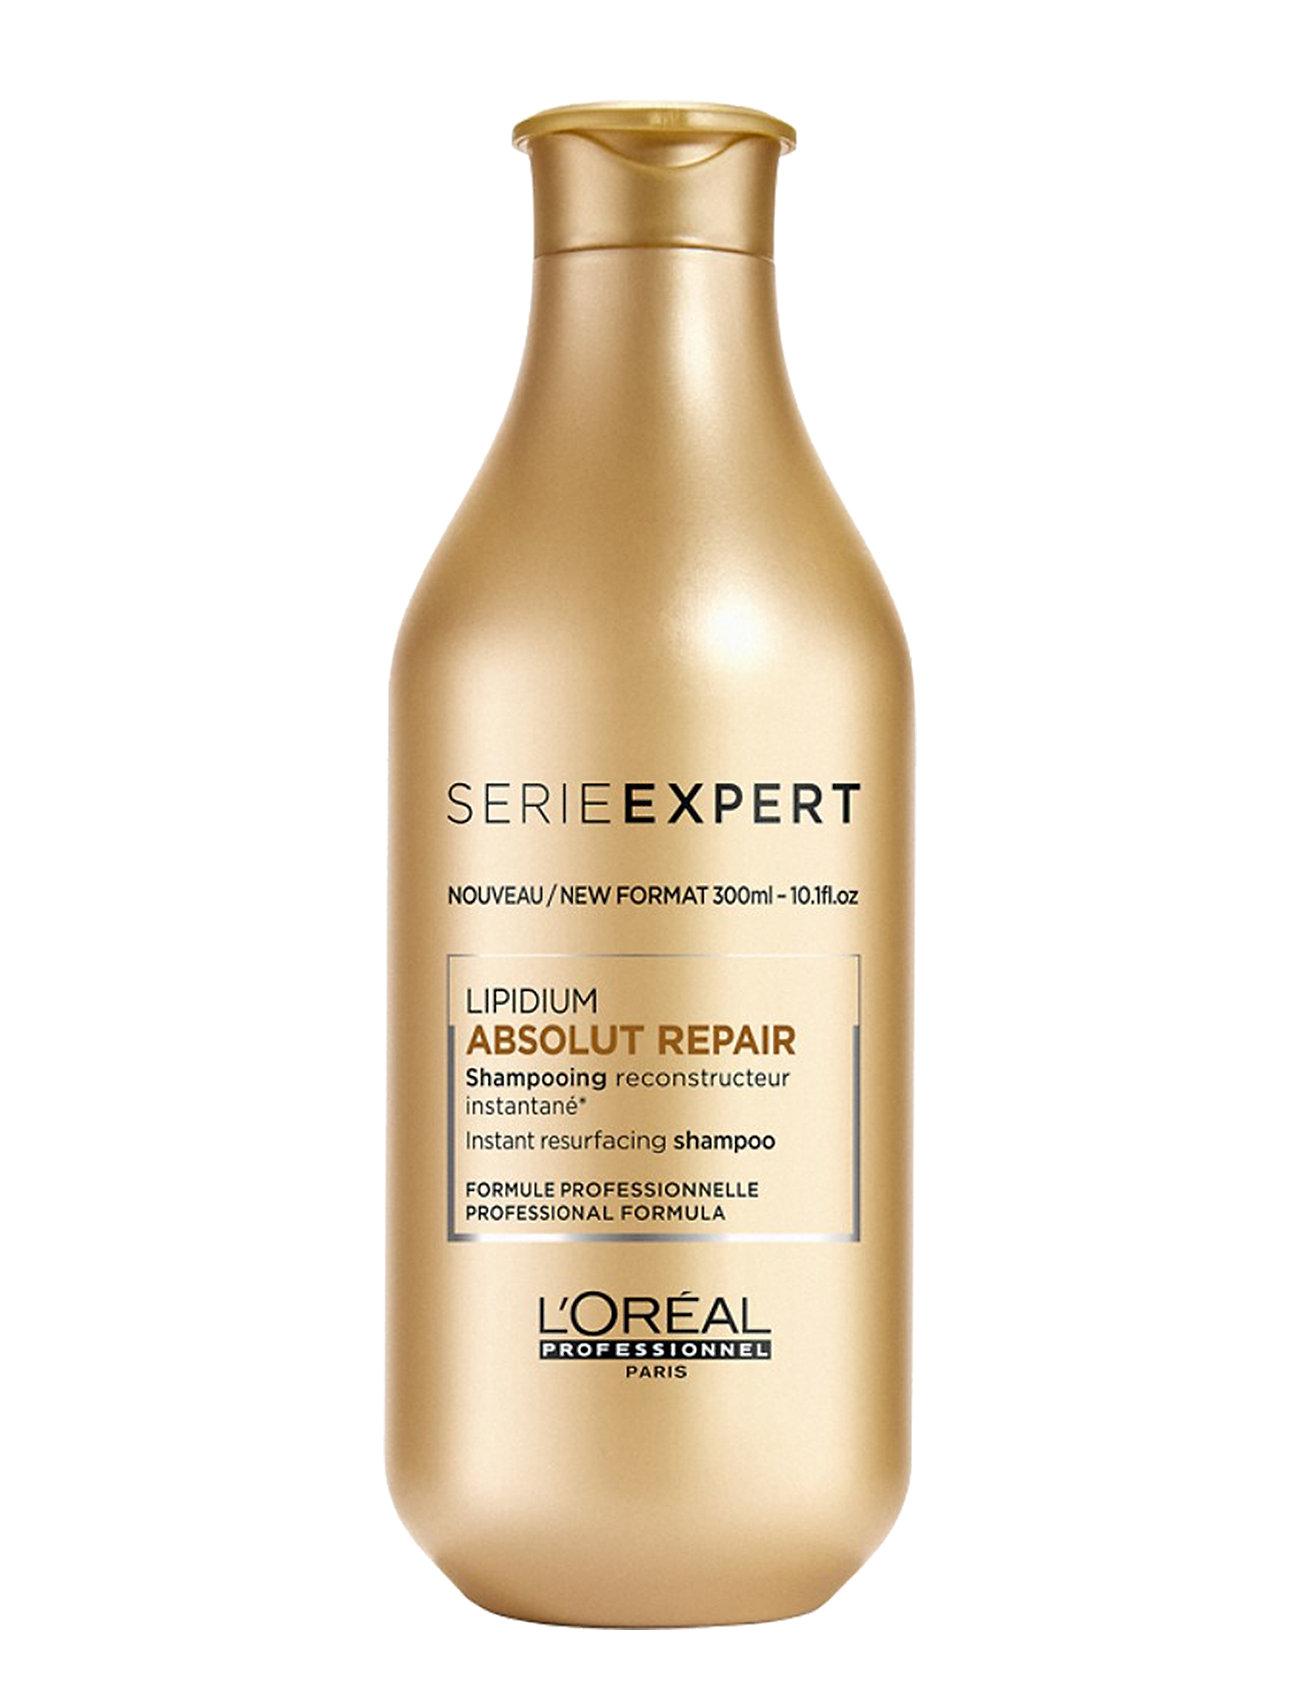 L'OréAl Professionnel Absolut Repair Shampoo - L'Oréal Professionnel